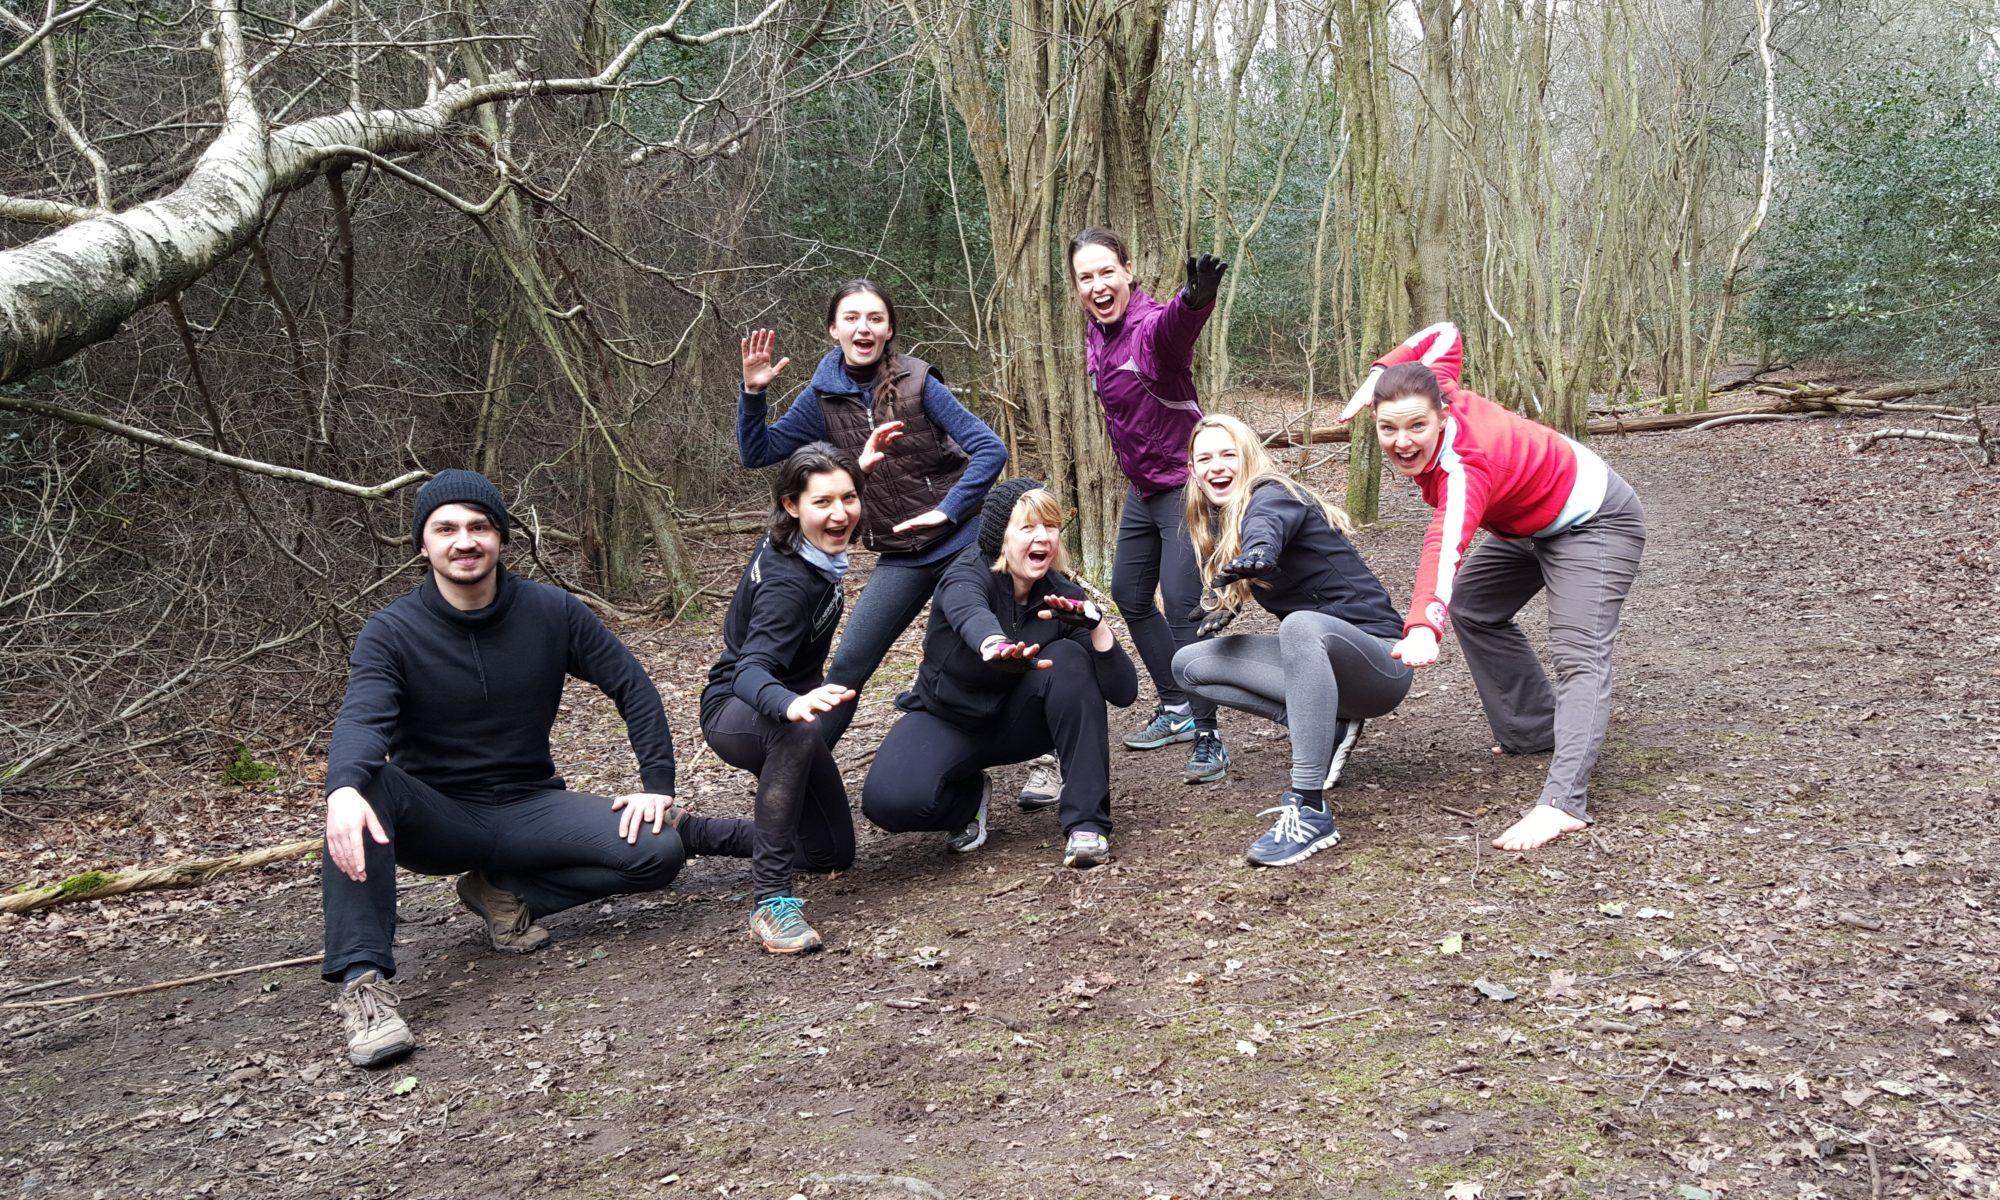 Weekend Dracula's Meditation and Hiking Retreat in Transylvania